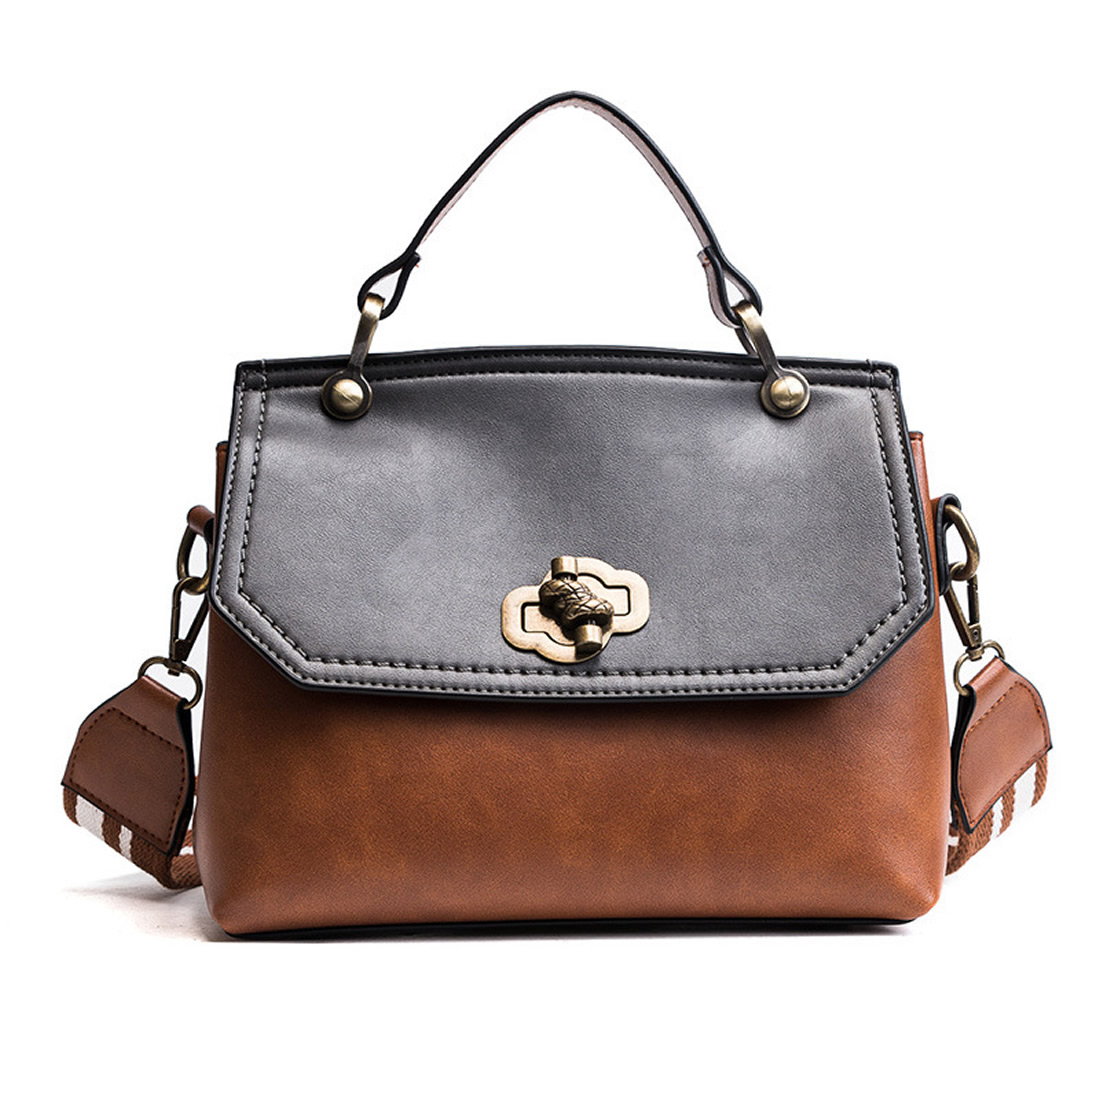 Fashion handbags online retailer 94